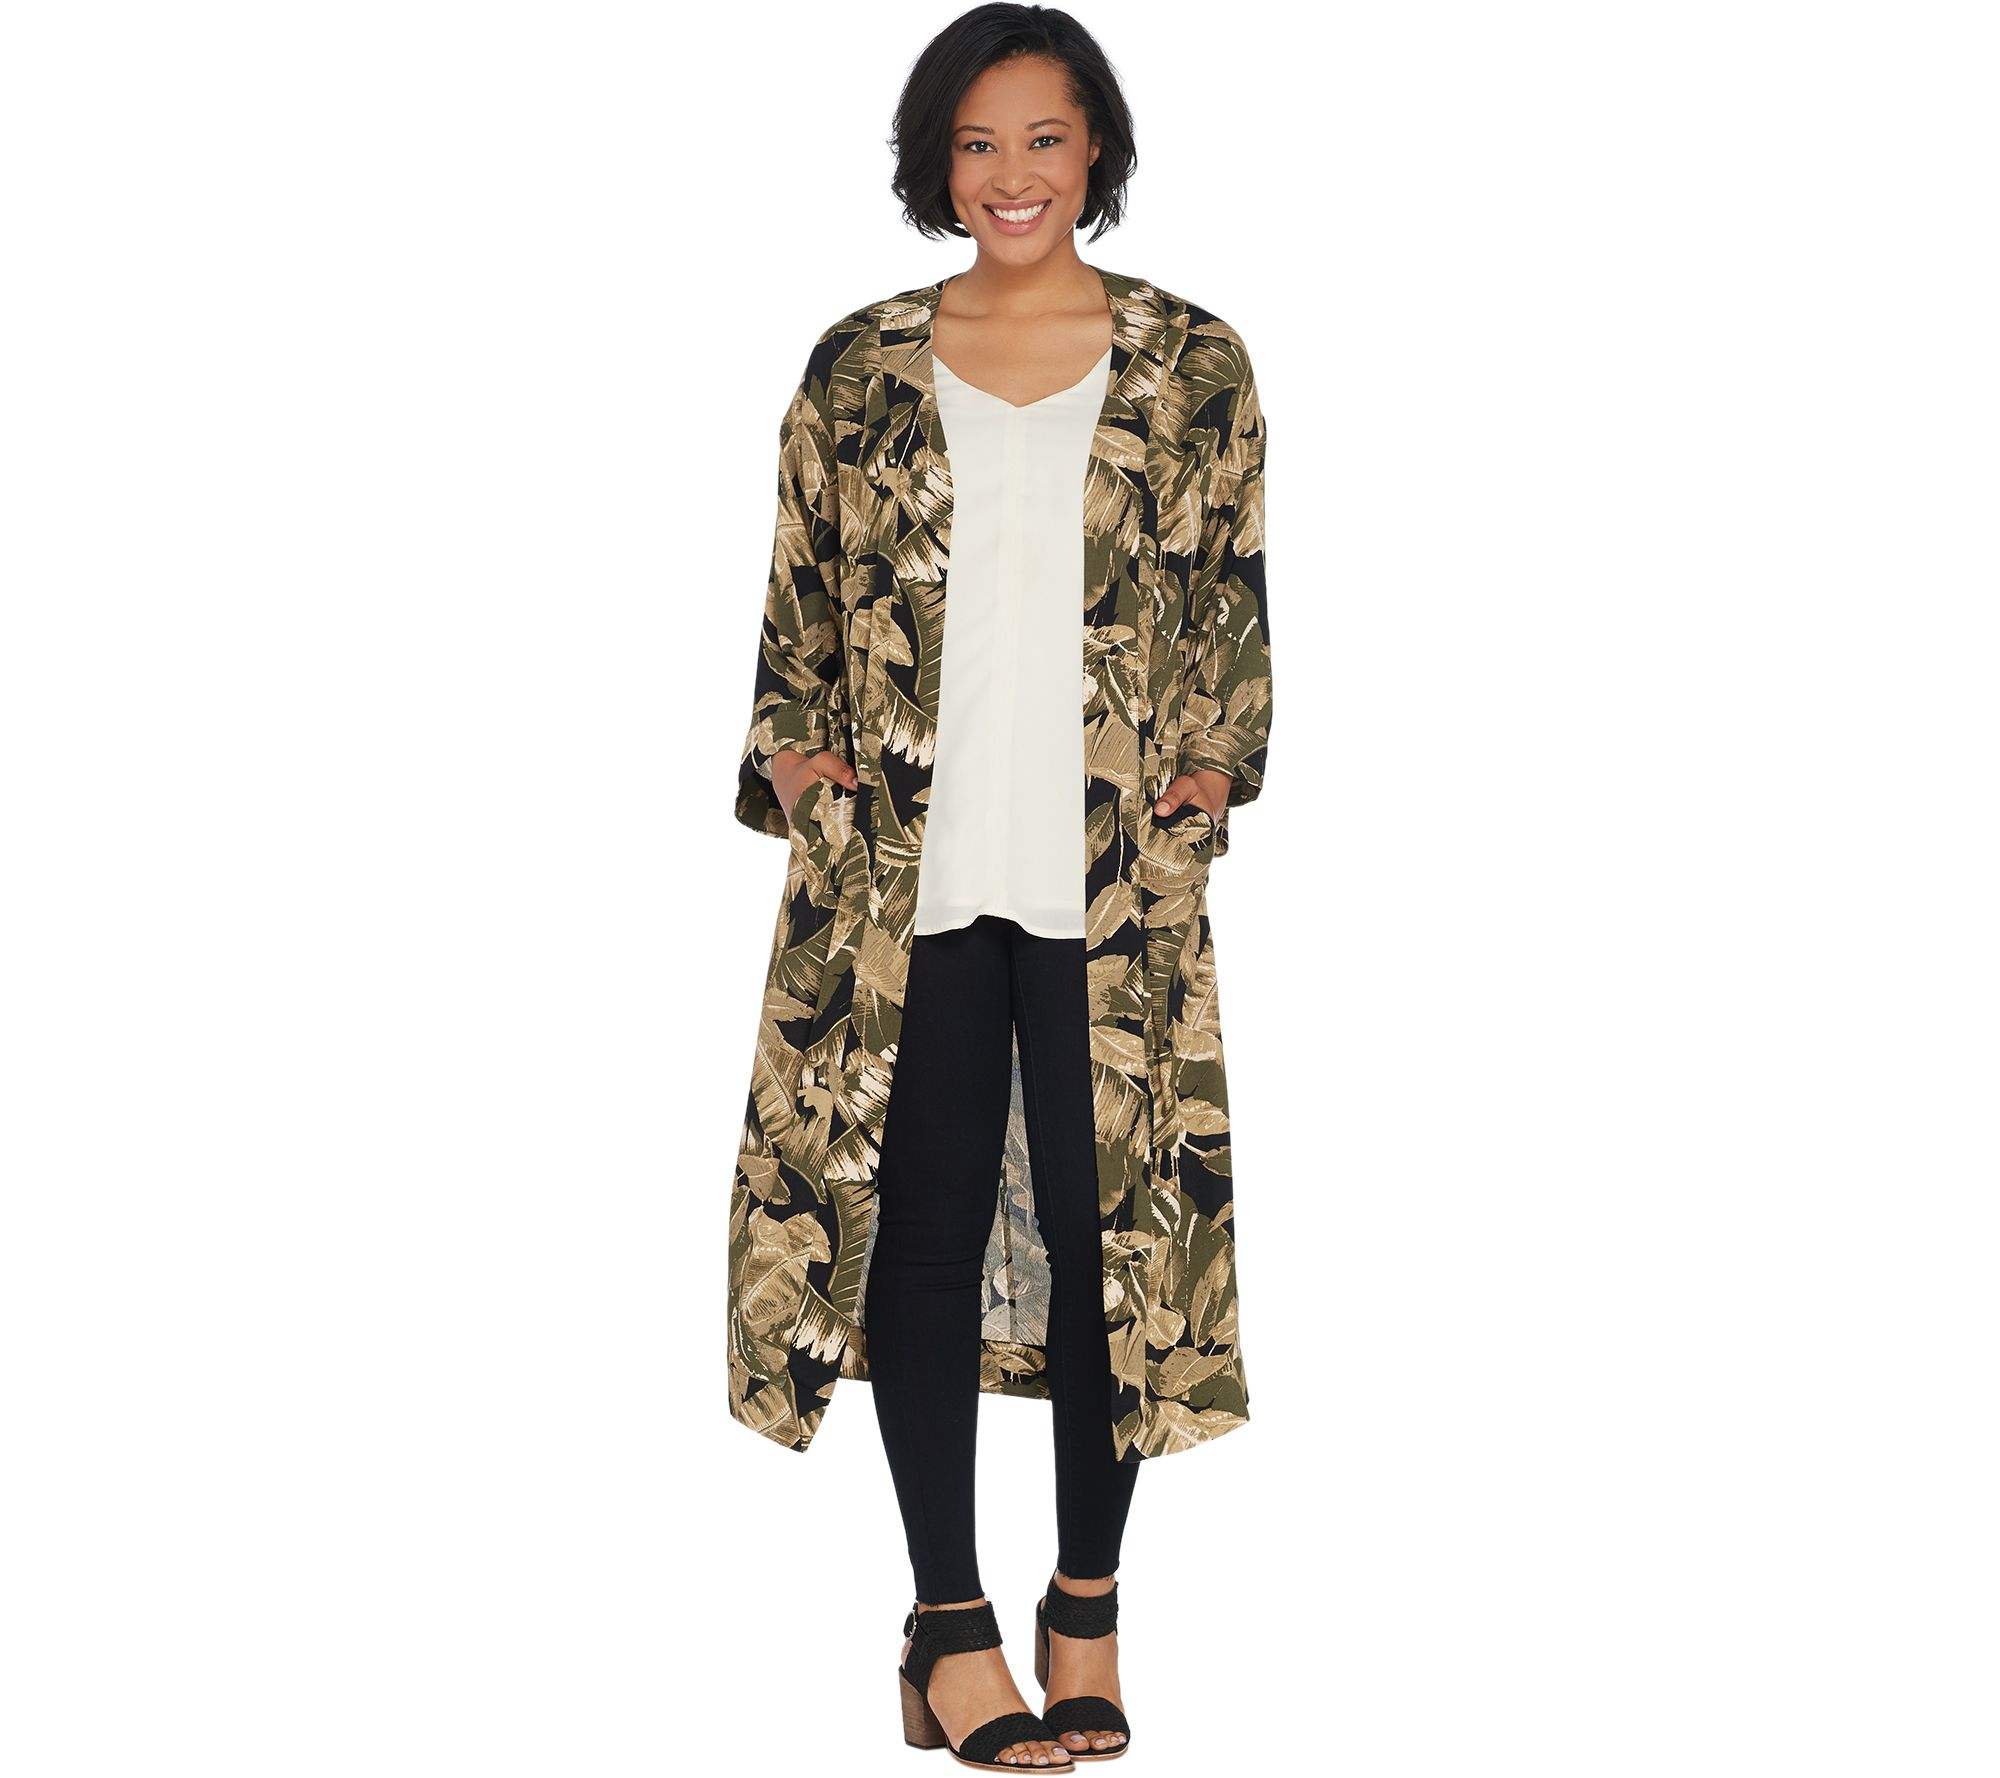 7b6c76523ccbd G.I.L.I. Regular Kimono Duster - Page 1 — QVC.com